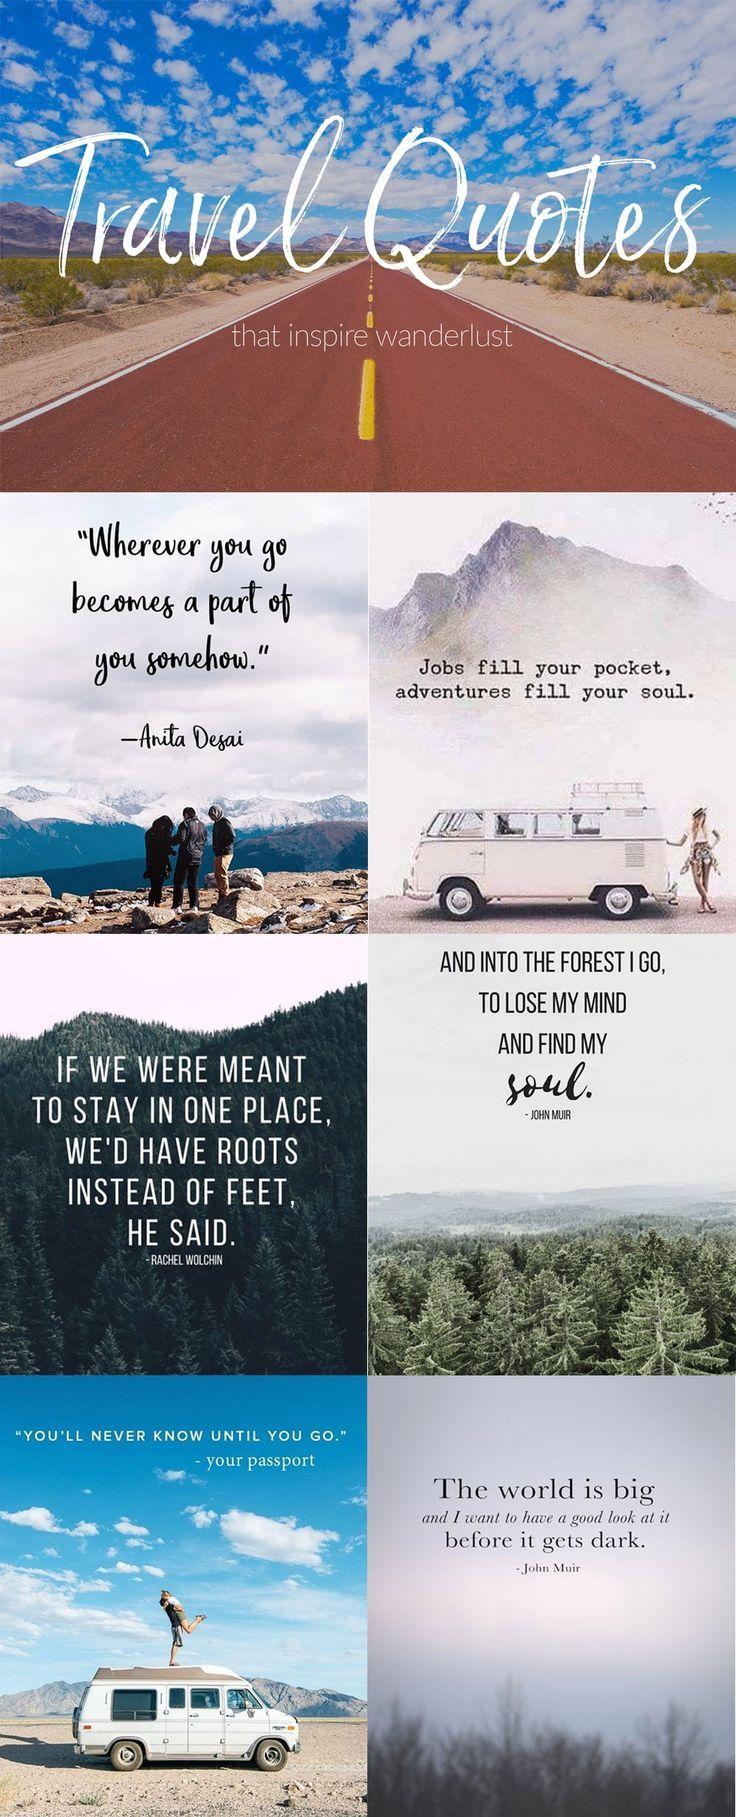 My Favorite Wanderlust Quotes | Wanderlust Crew